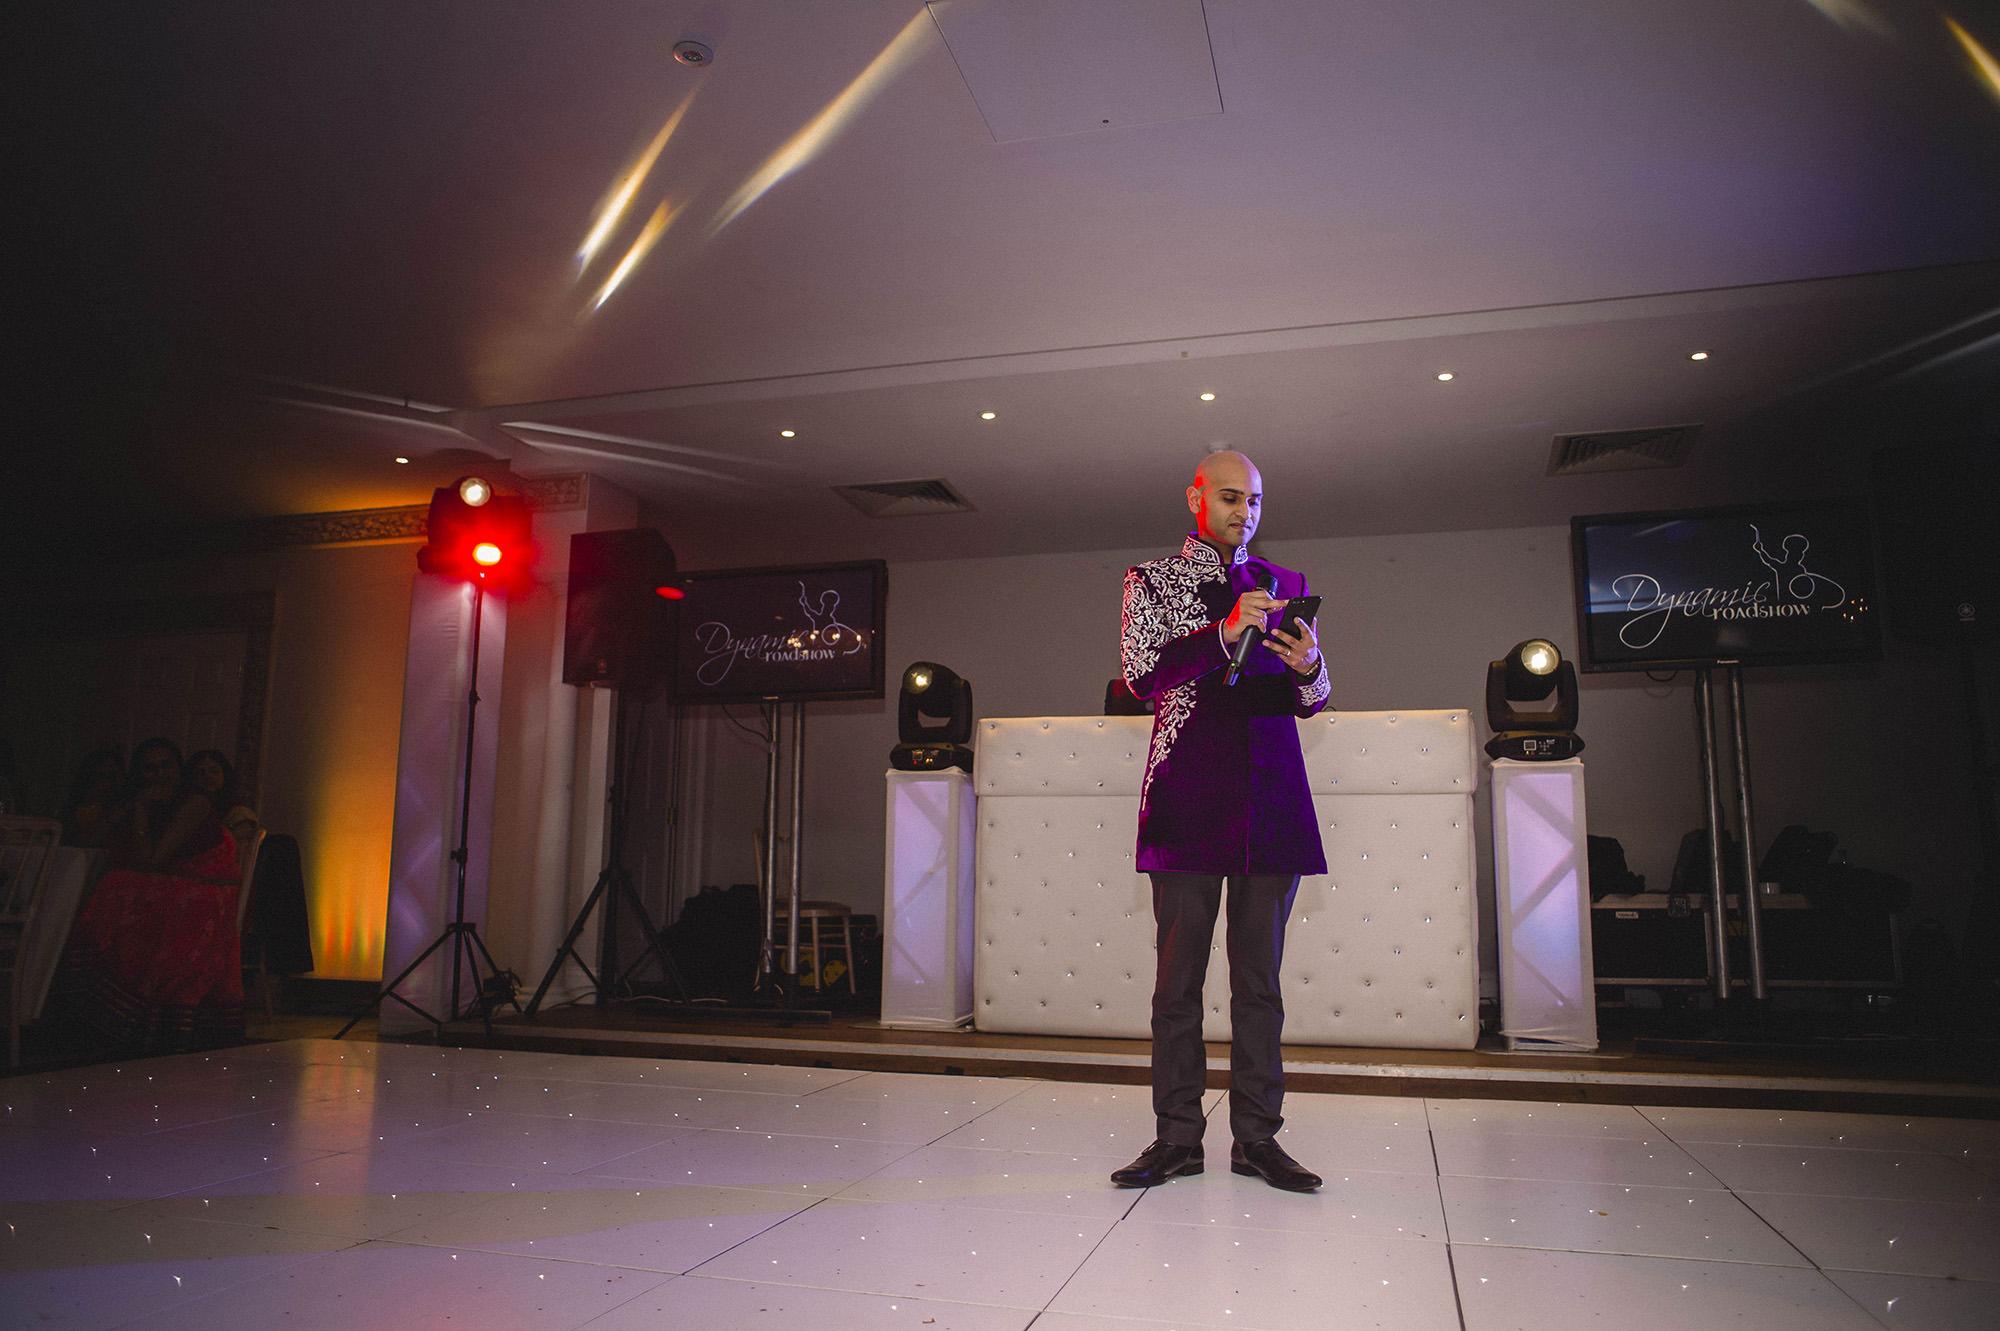 grooms speech at his wedding reception